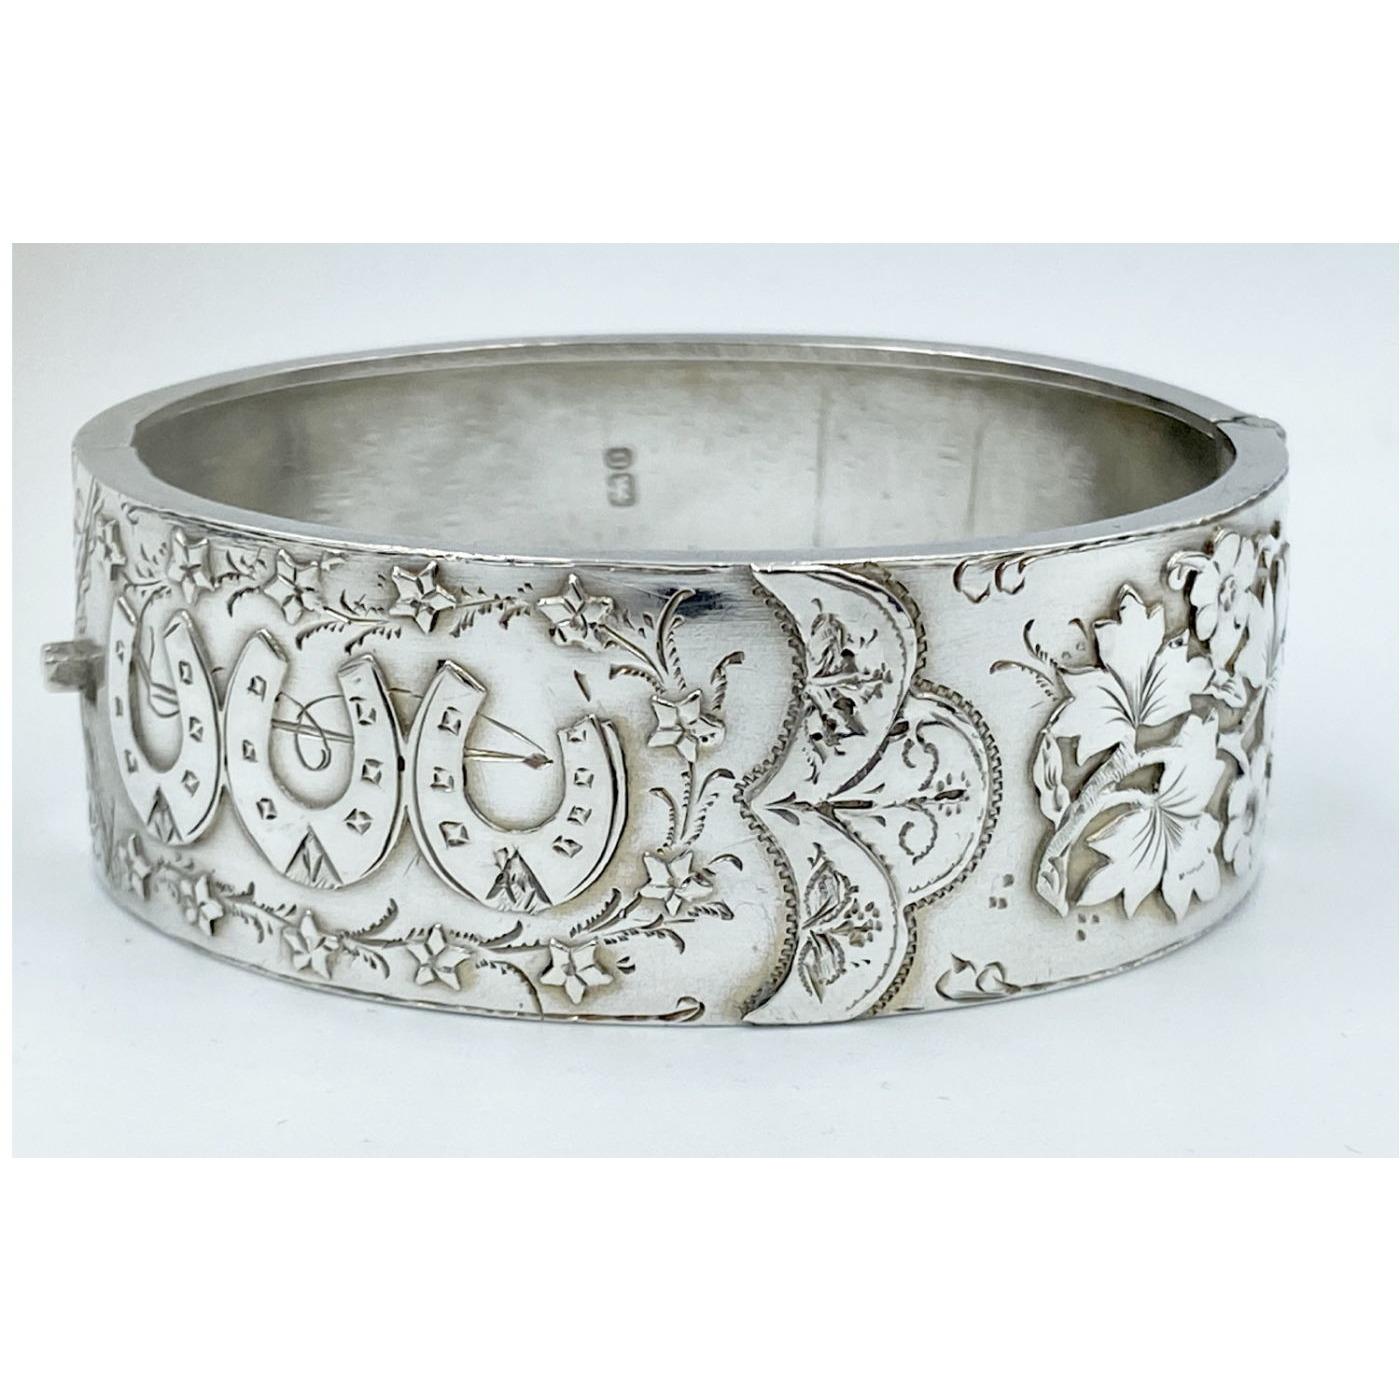 Extraordinary Horseshoe Floral English Silver Bangle